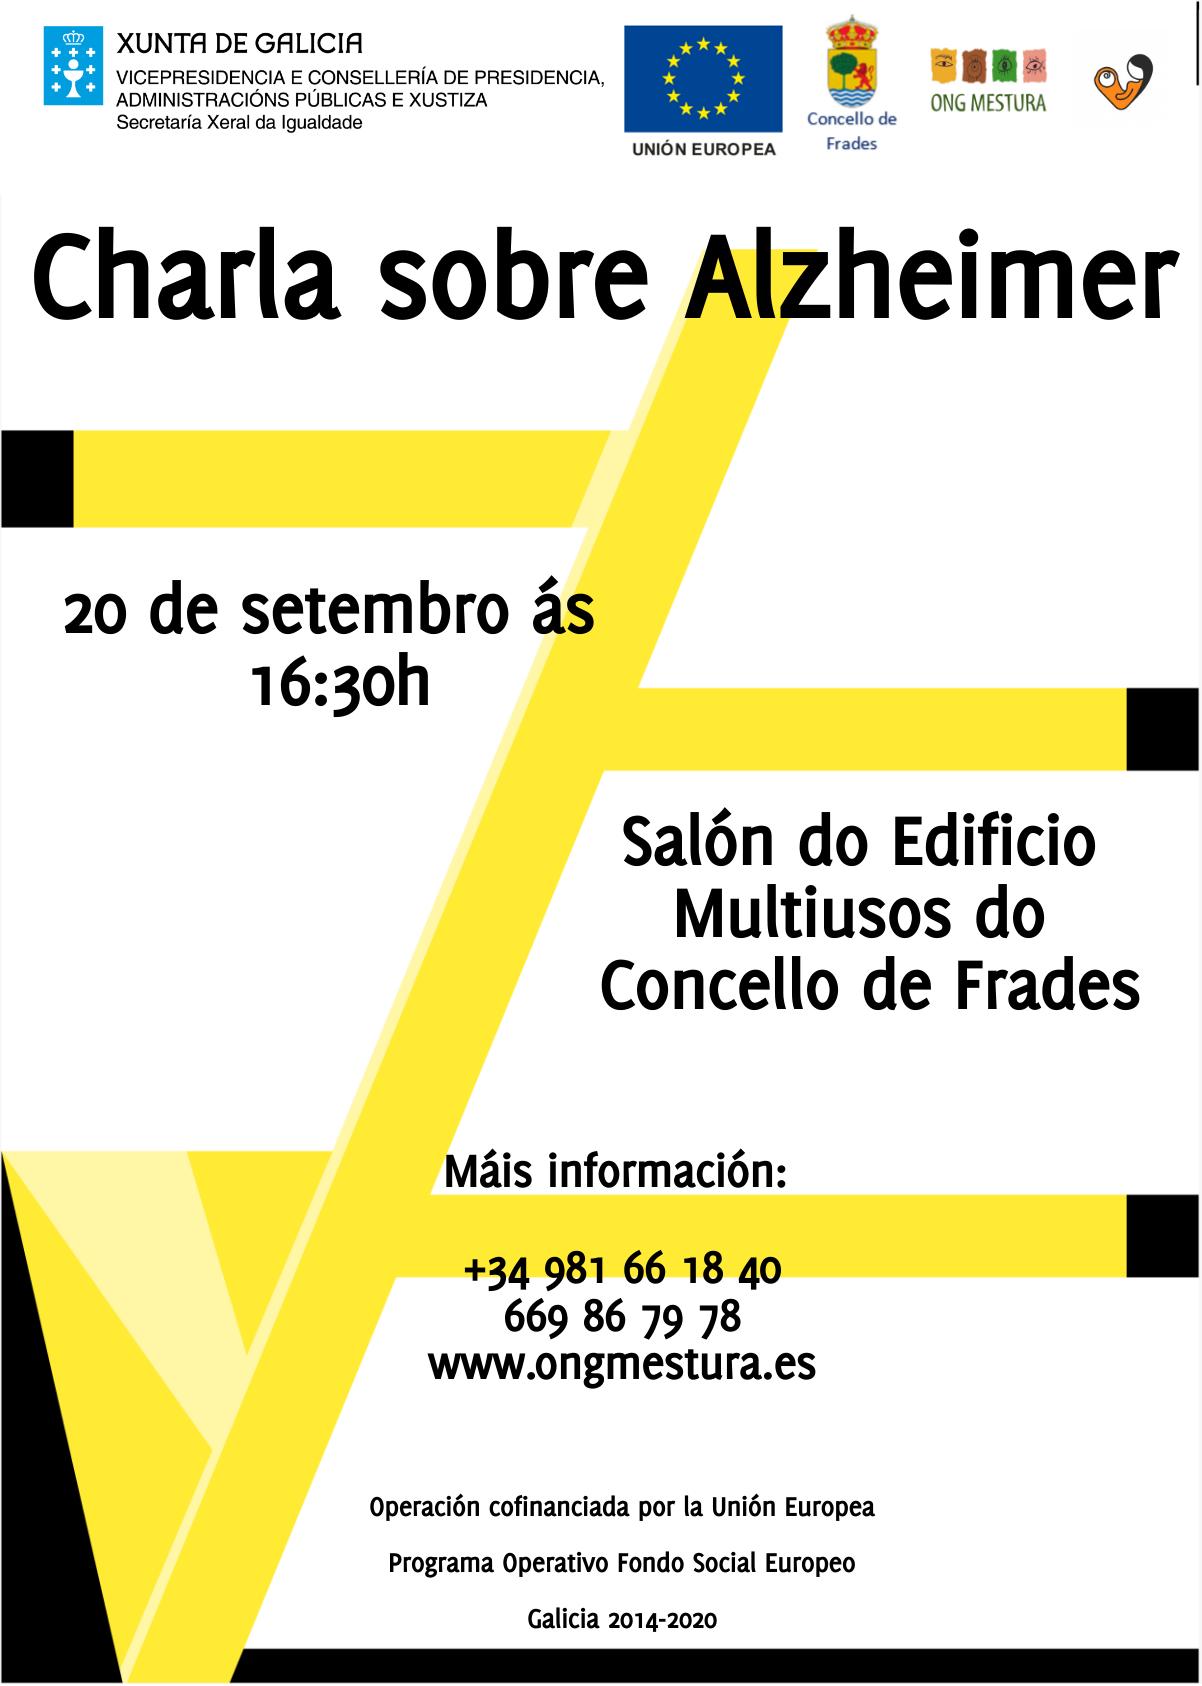 cartel, alzheimer, Frades, ong mestura, charla